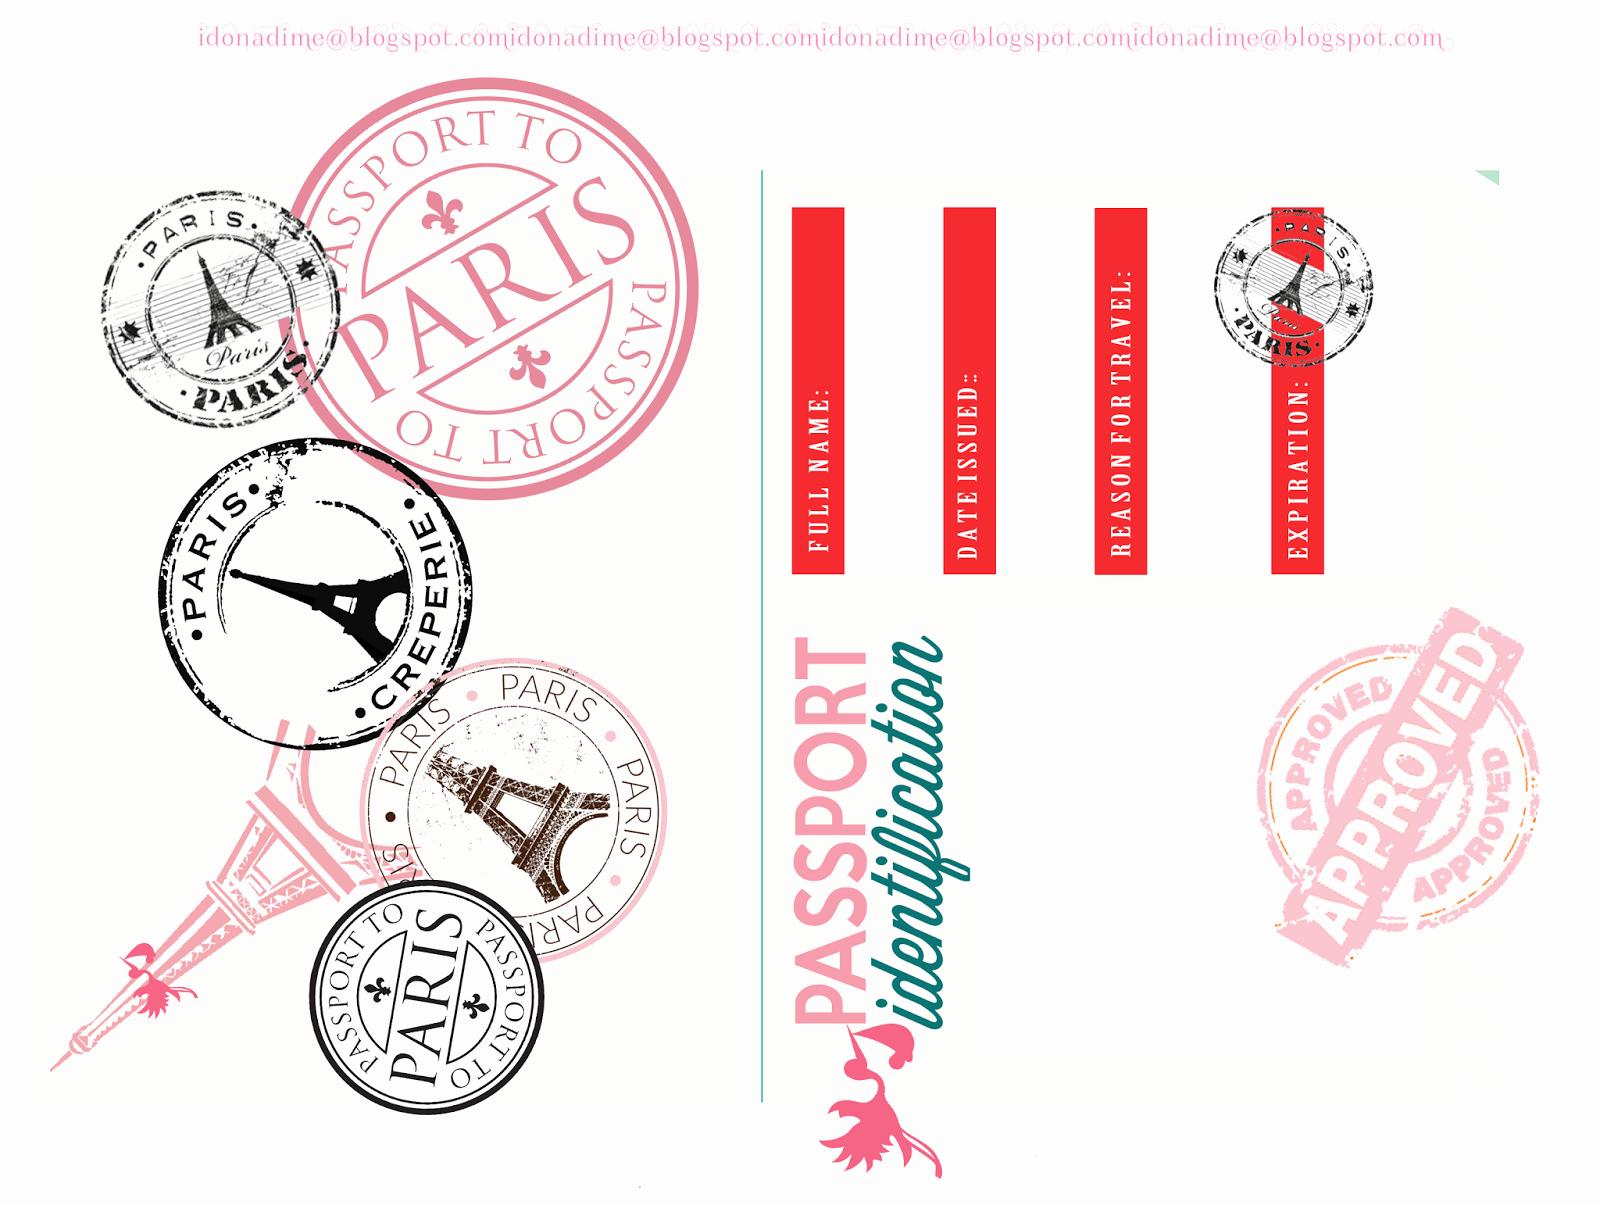 Passport Invitation Template Free New I Do A Dime Free Paris Baby Shower Passport Invites